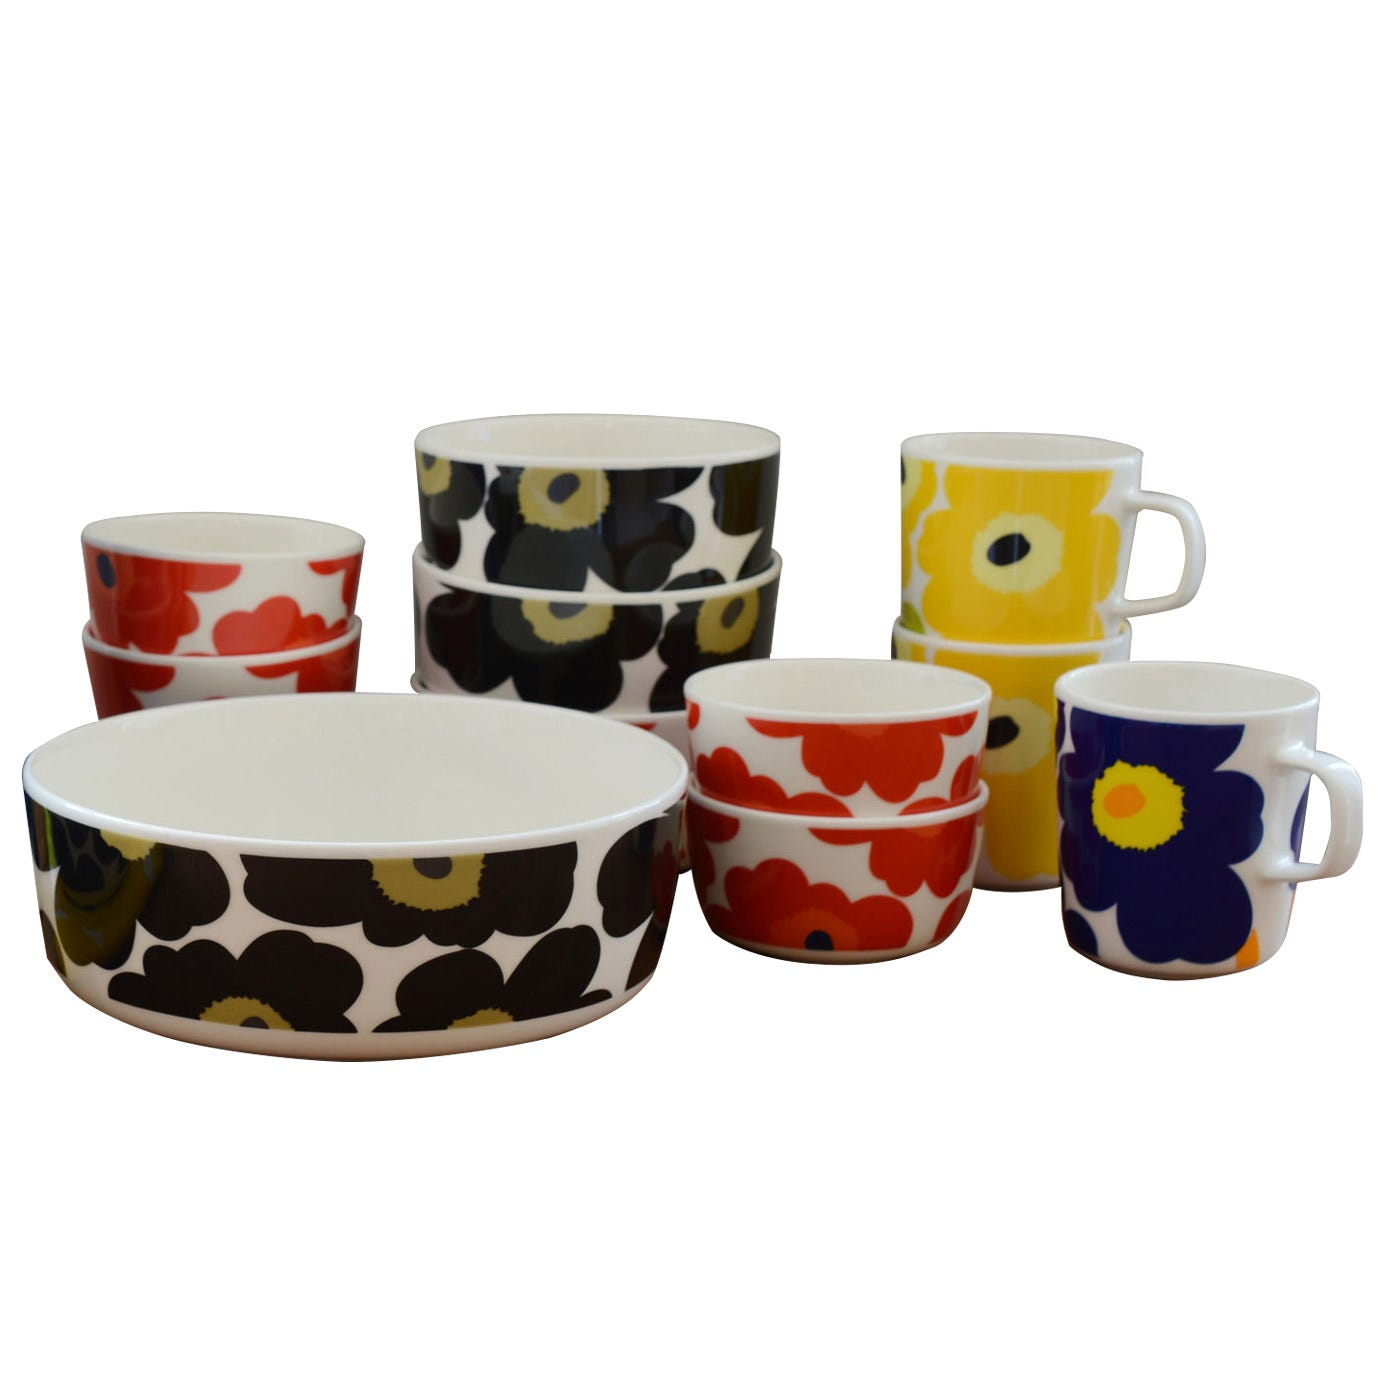 Marimekko Unikko Dinnerware